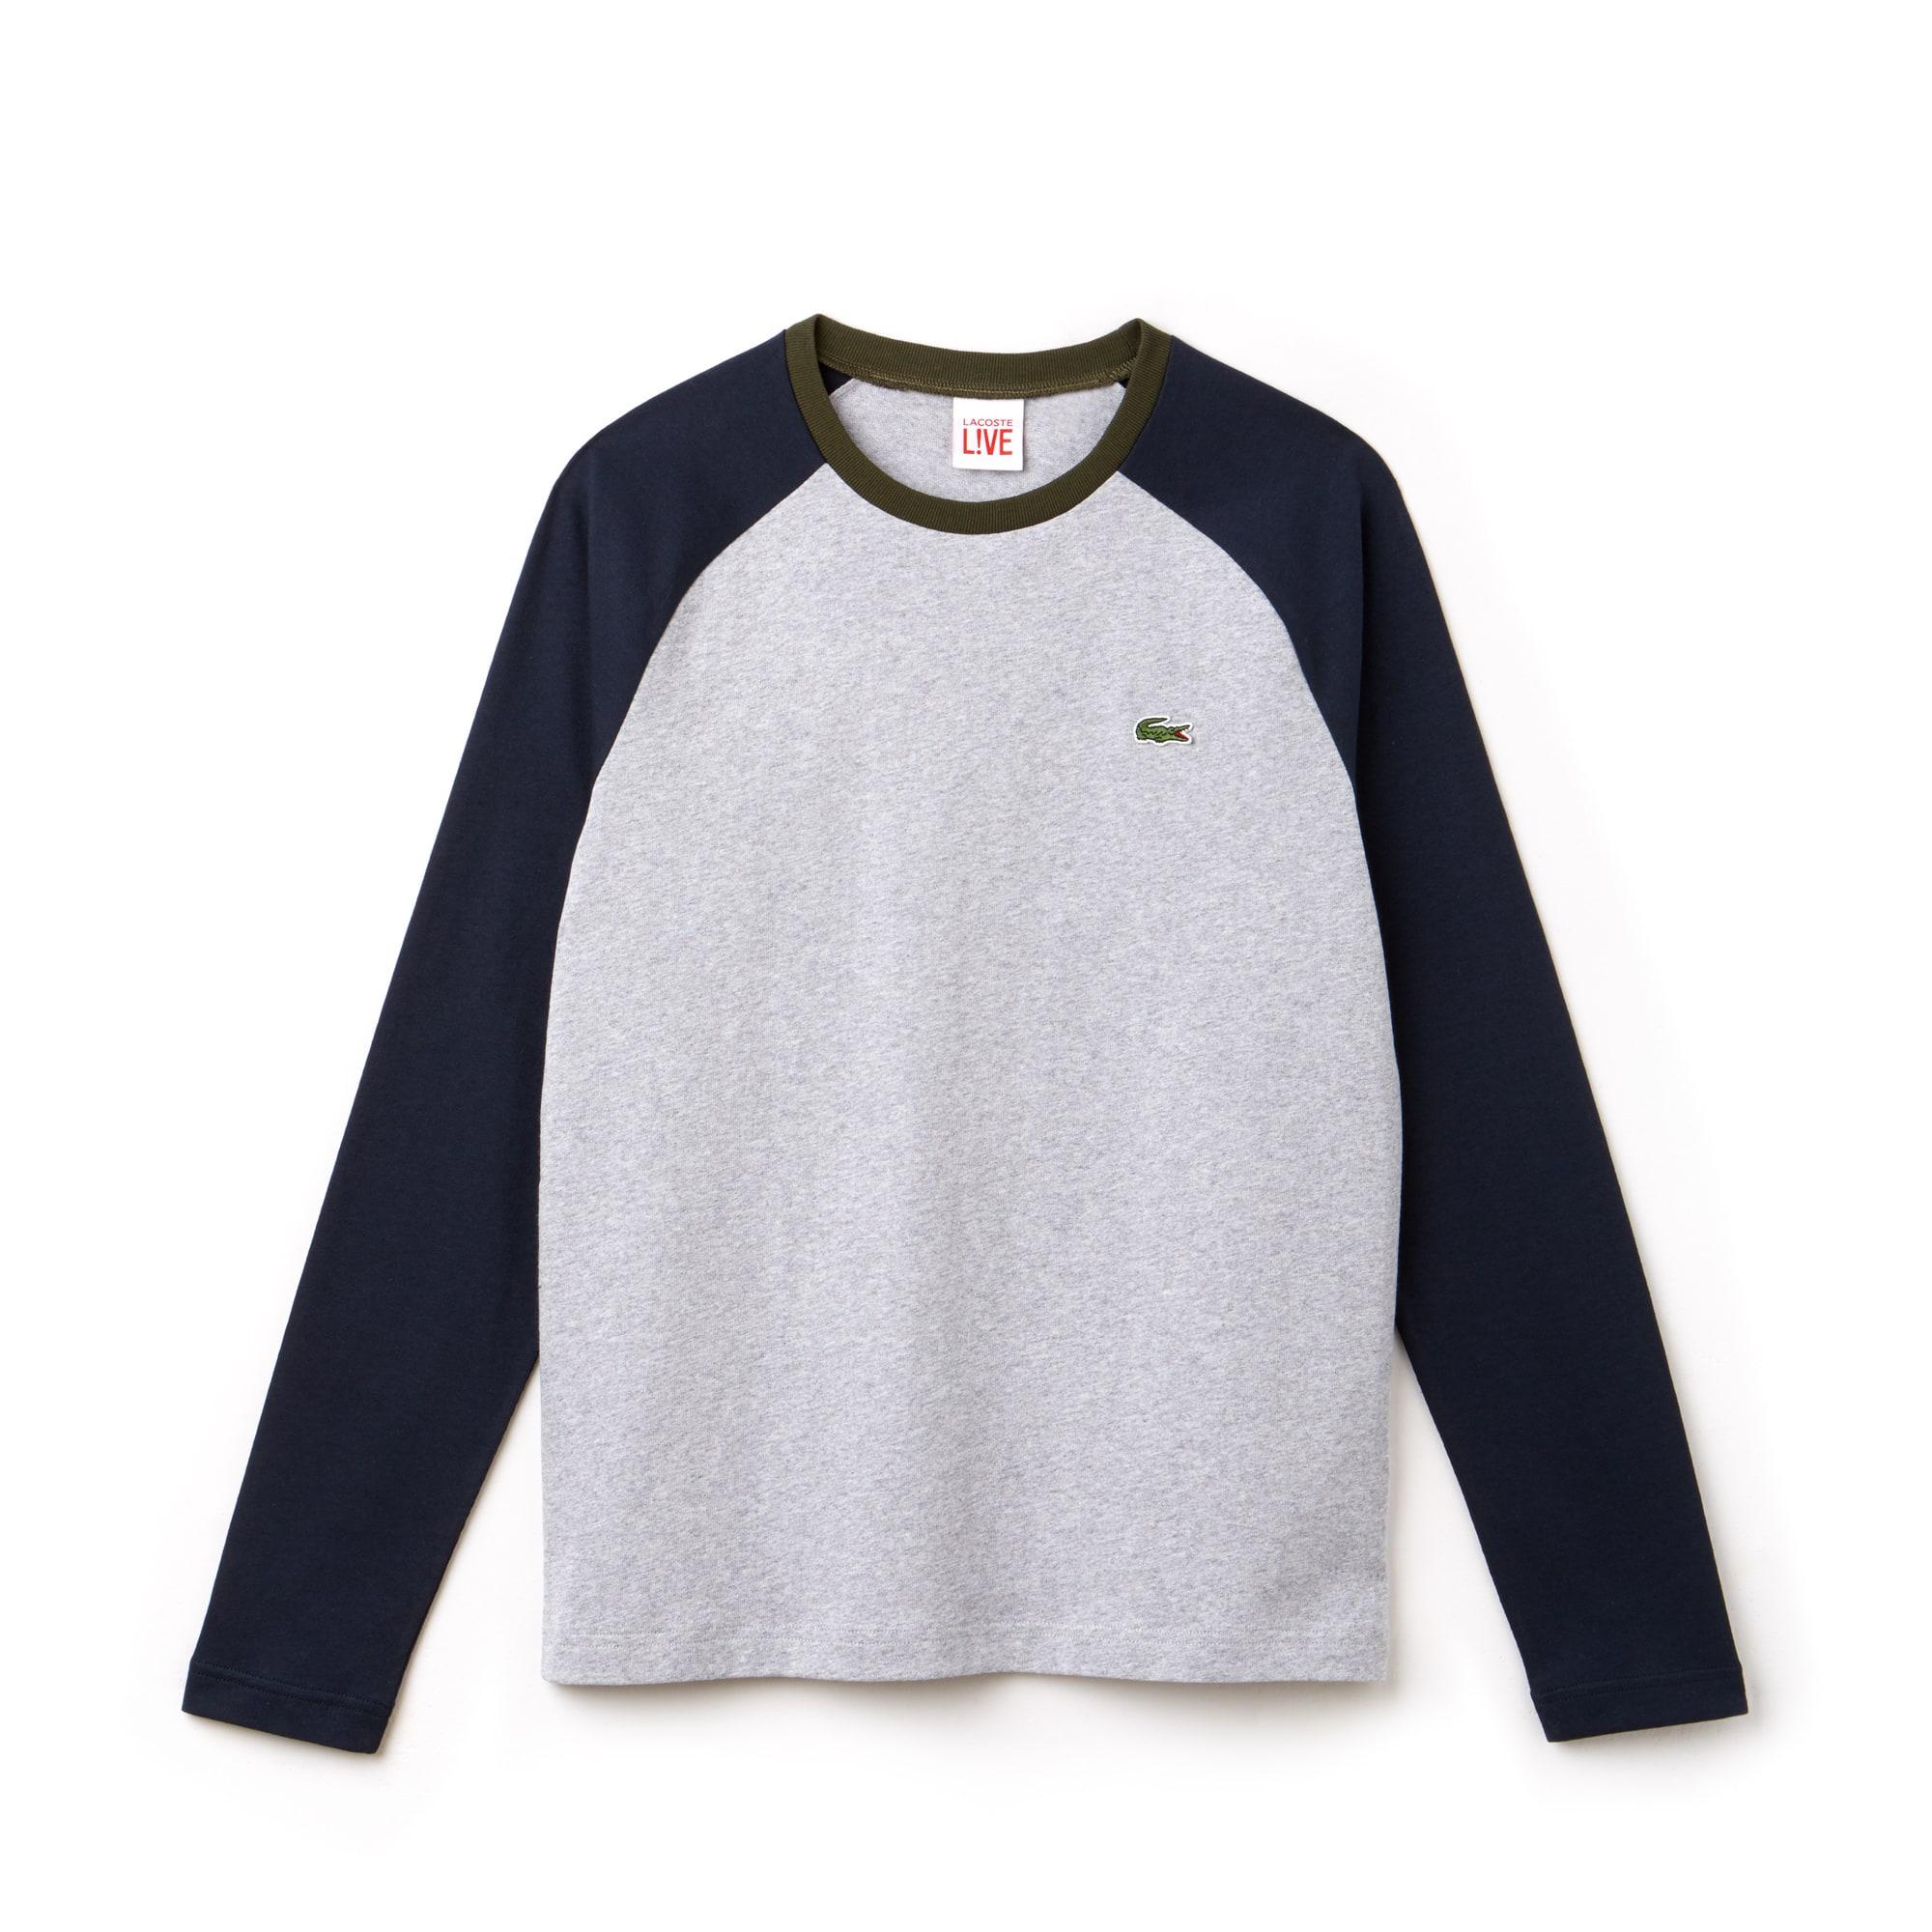 6f3ca40bda8 Men s Lacoste LIVE Bicolor Jersey T-shirt ...